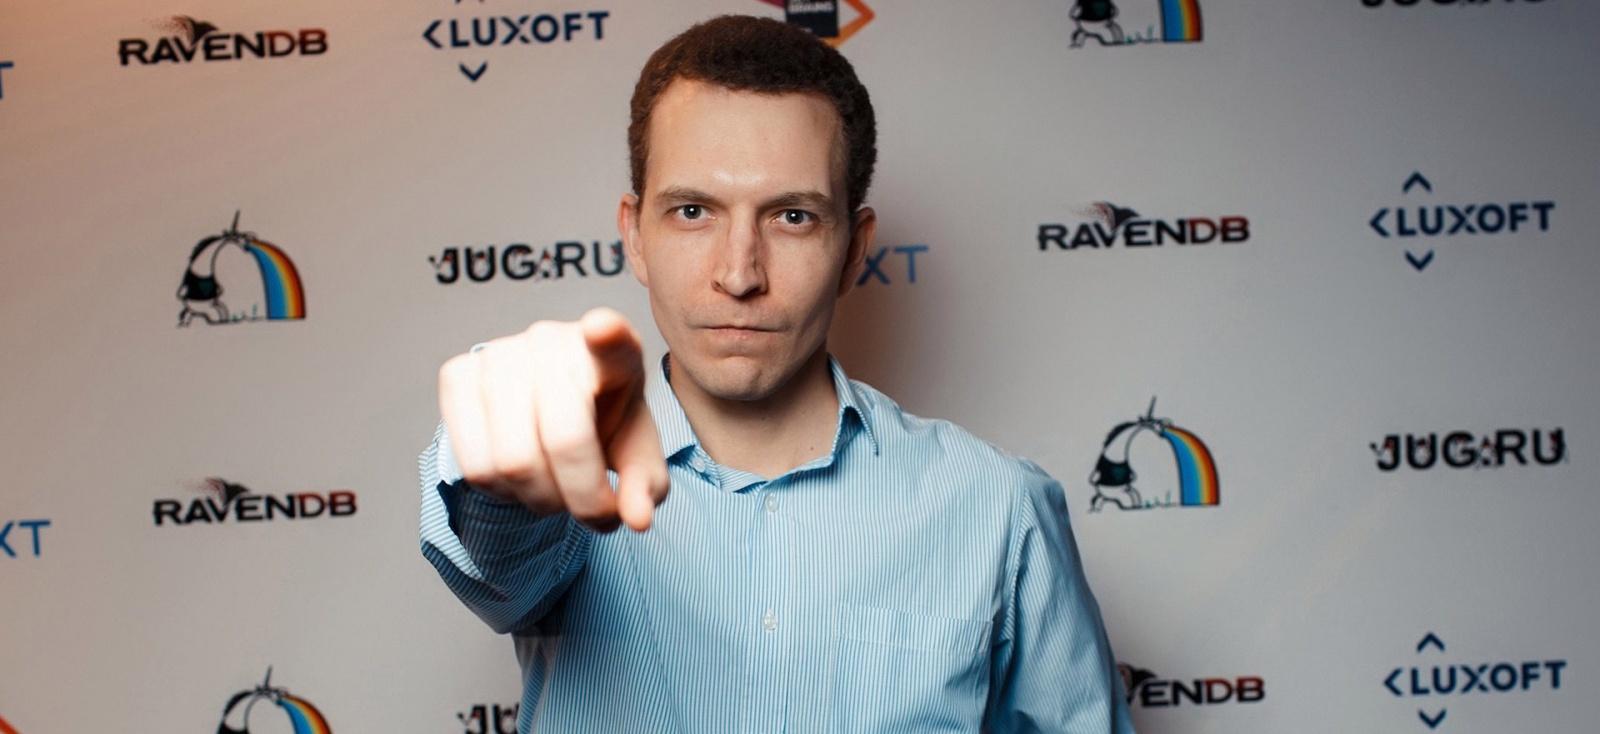 DevOops 2017 Piter: Новая конференция от JUG.ru Group, поговорим про DevOps - 9